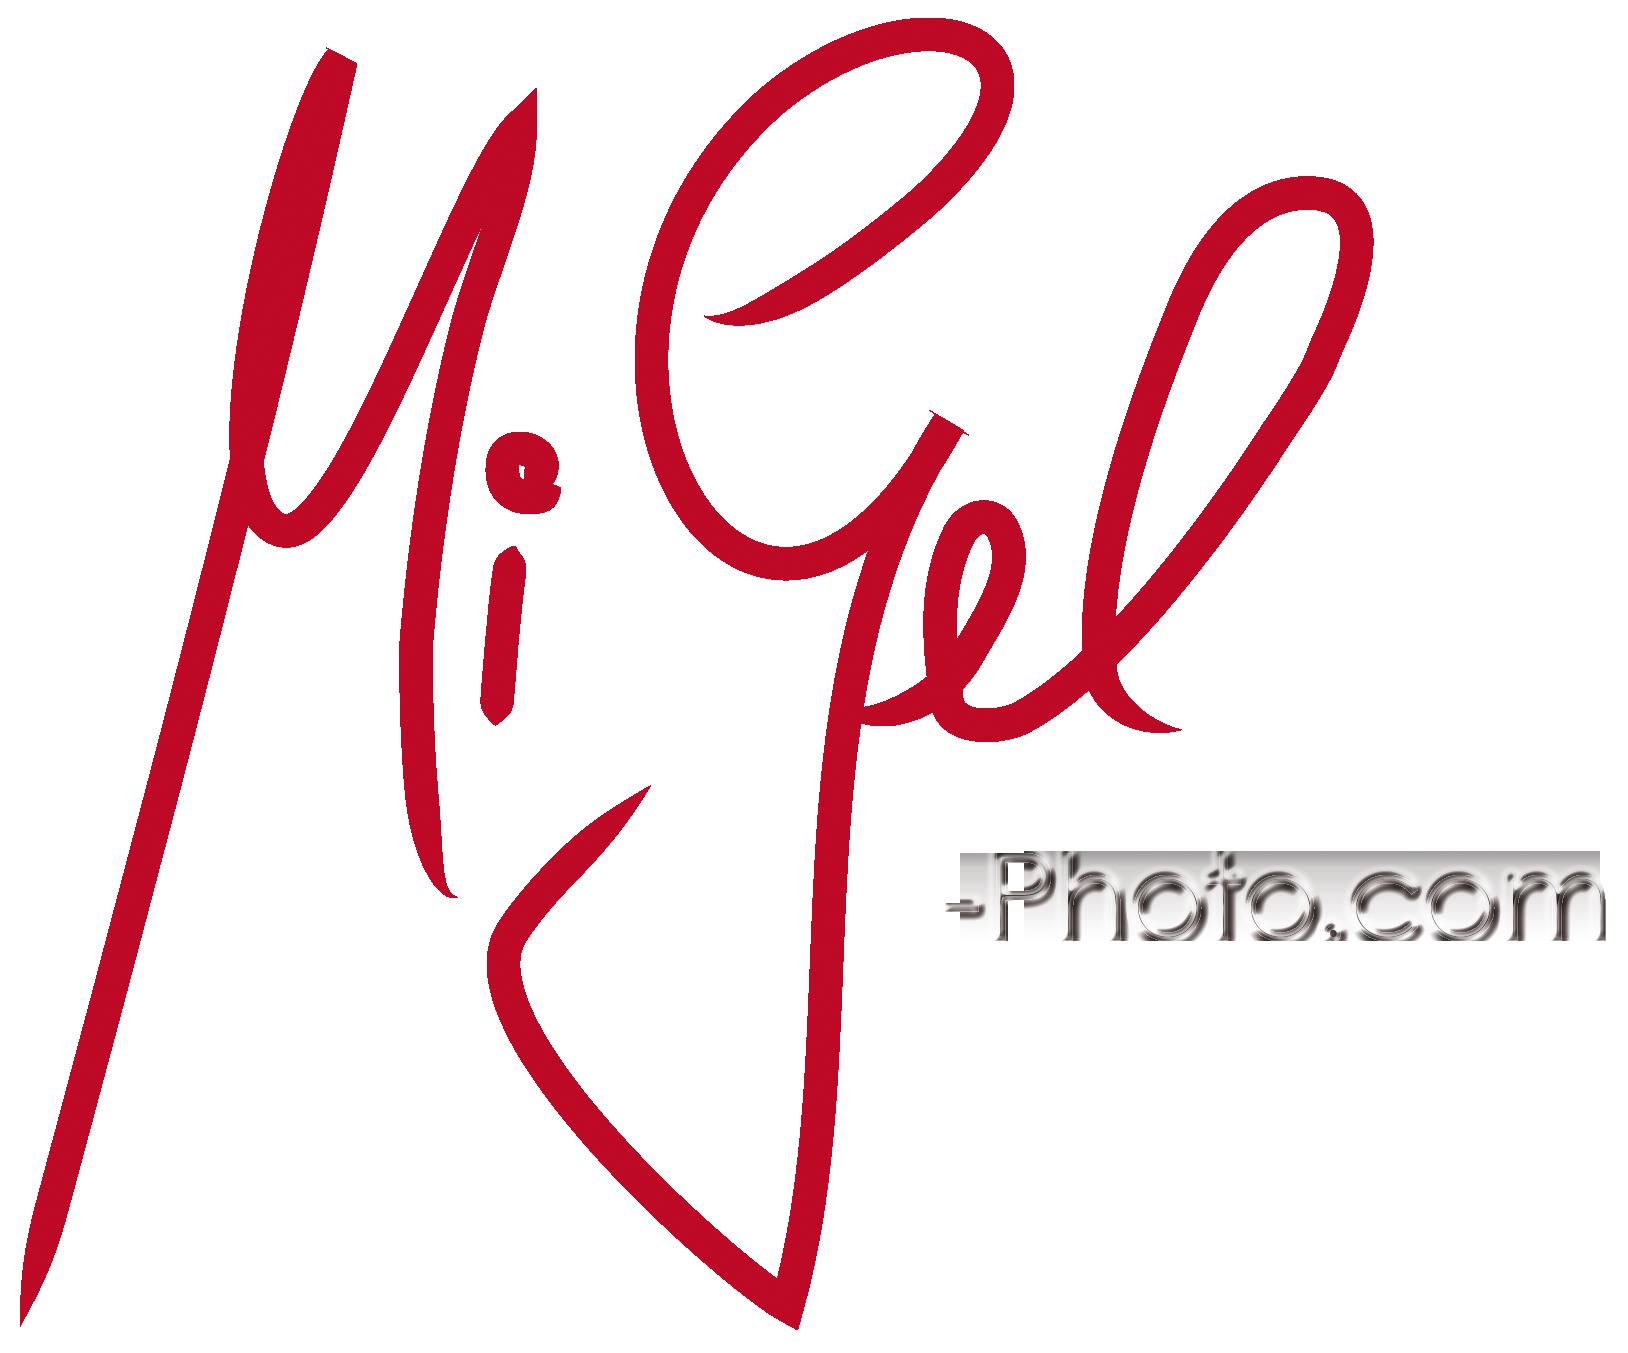 MiGel-Photo